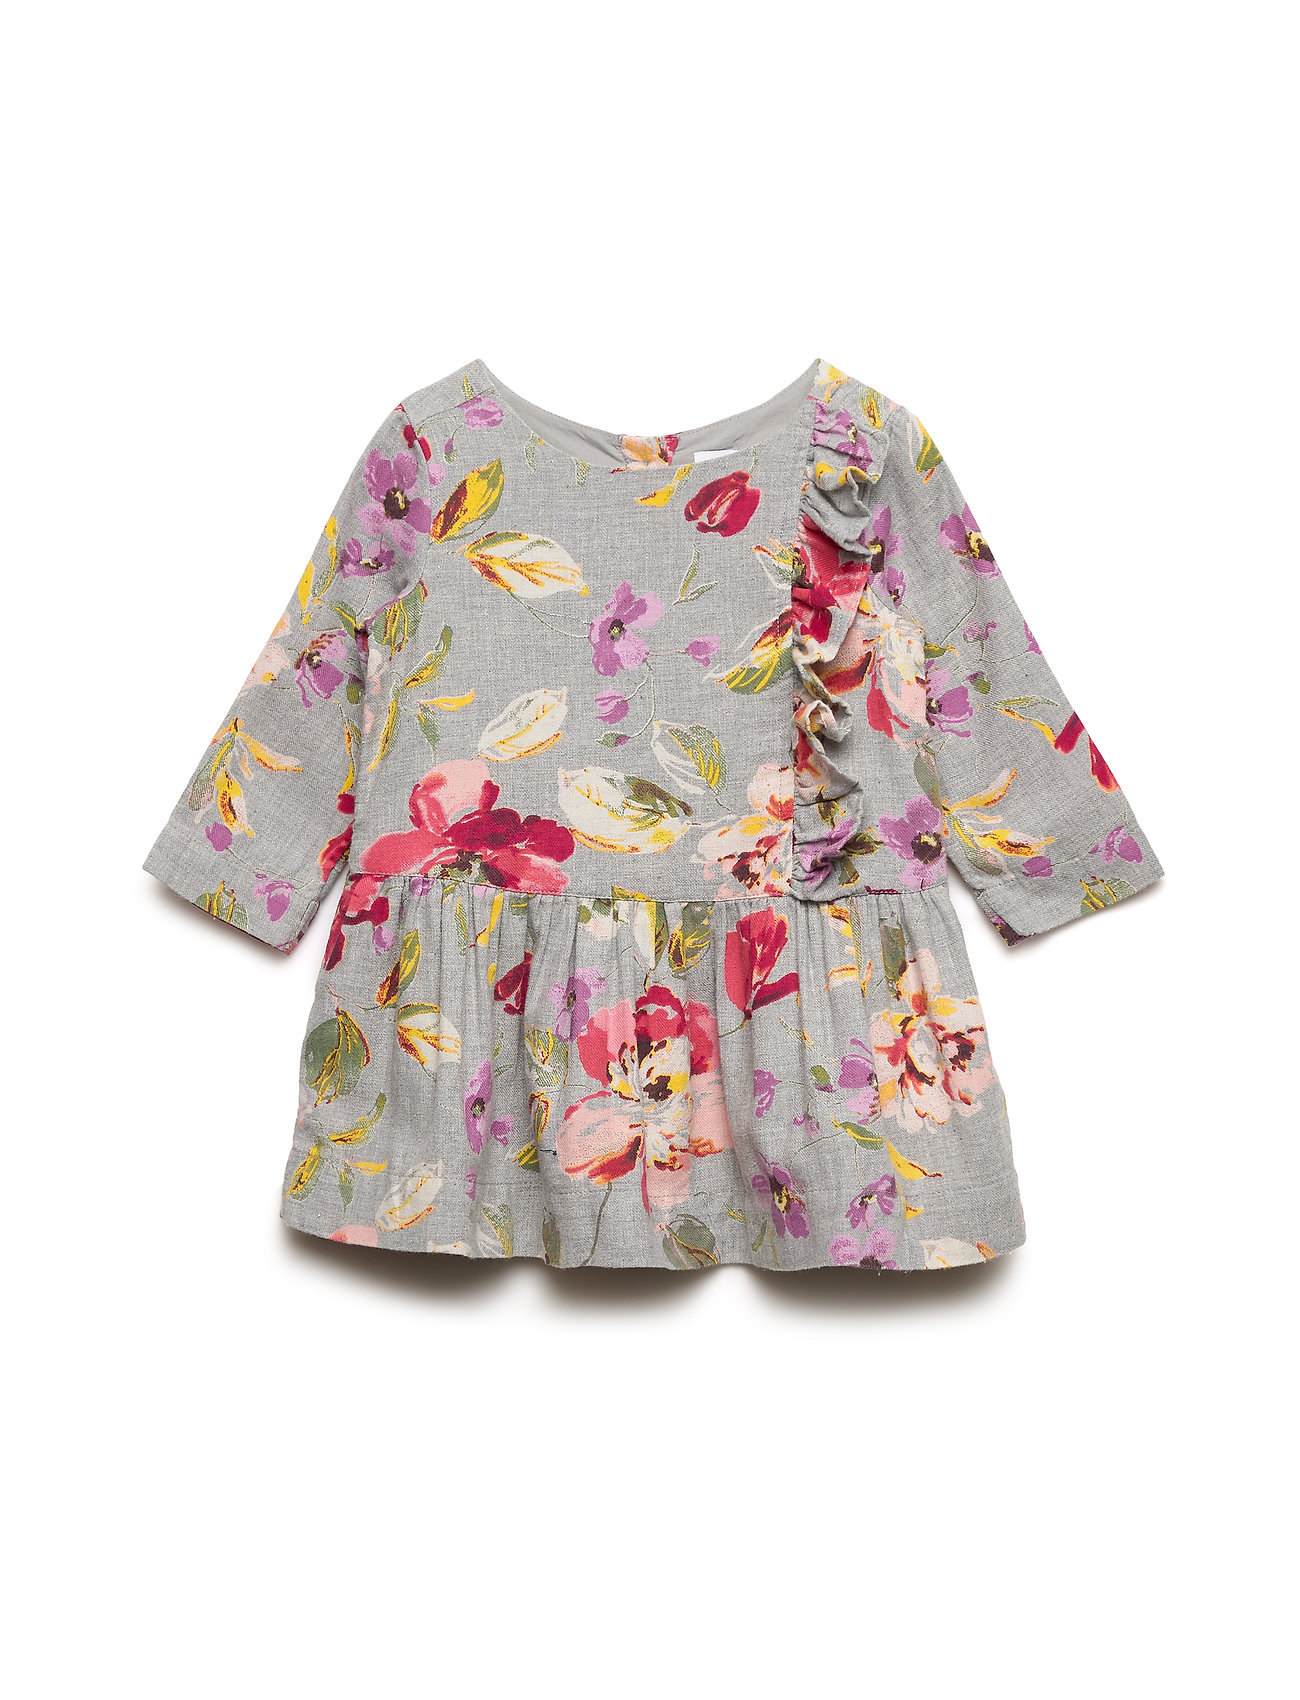 GAP Toddler Floral Drop-Waist Dress - FLORAL PRINT